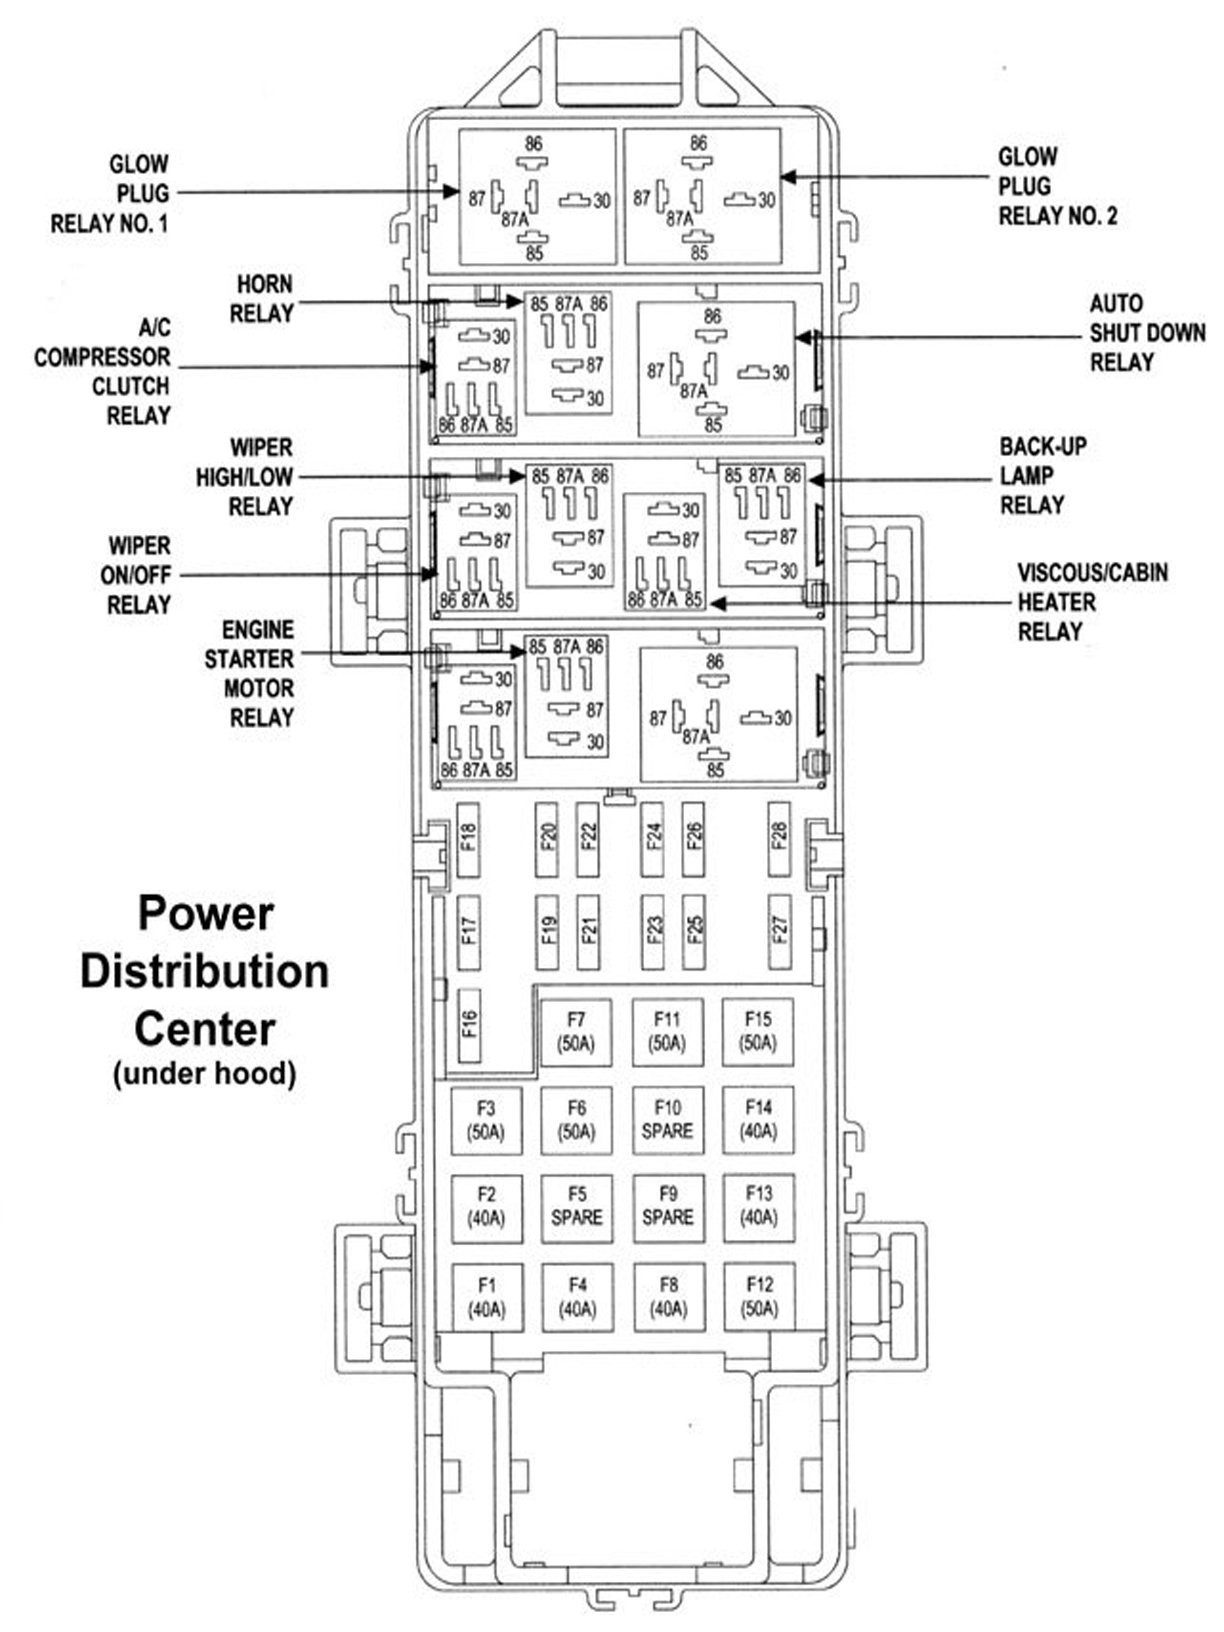 07 jeep grand cherokee fuse diagram